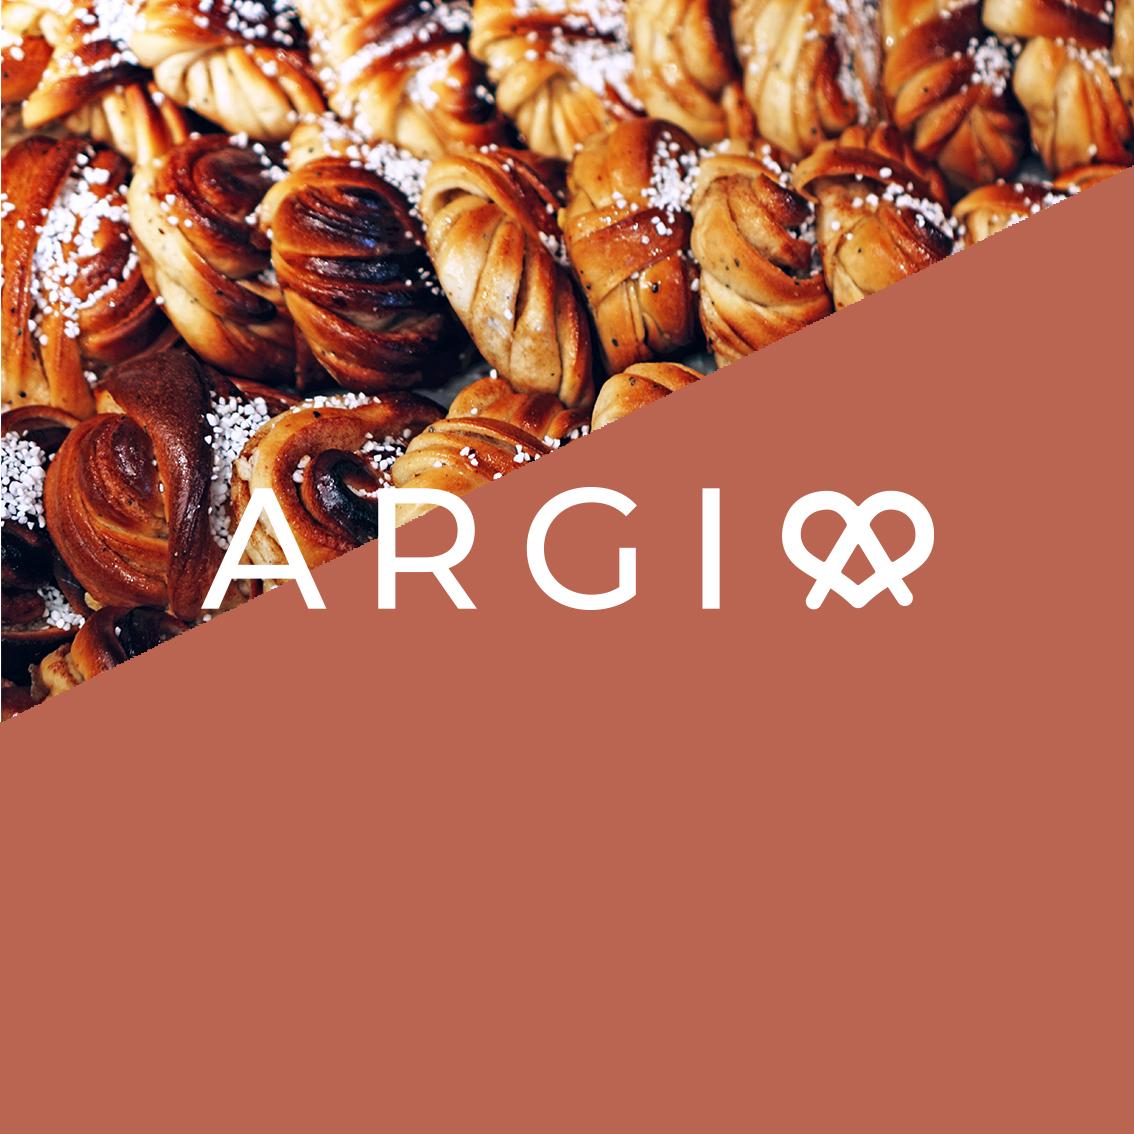 Argio-pastry-02.jpg